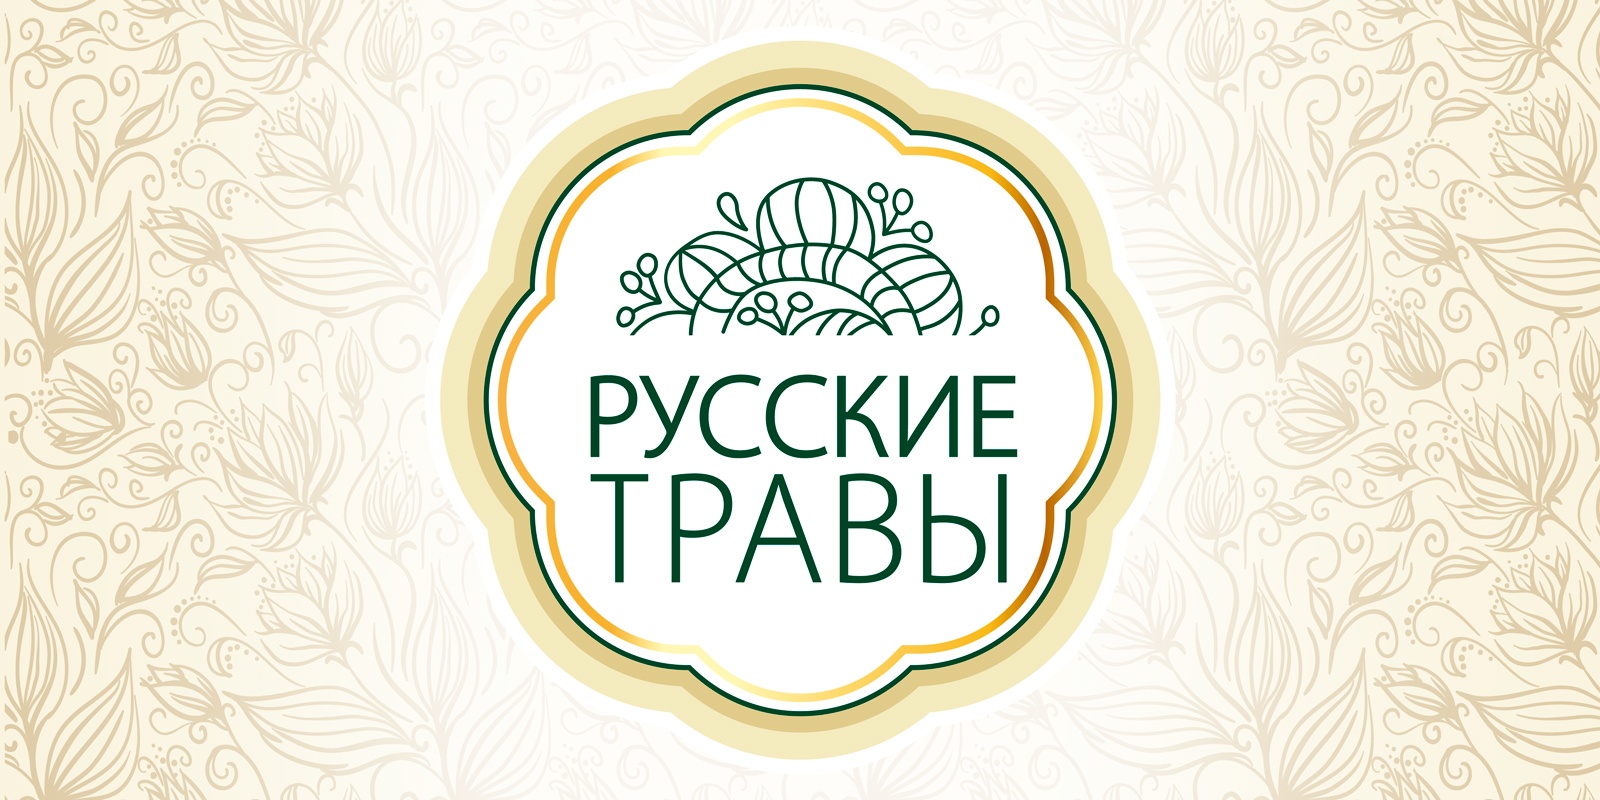 ТМ «Русские травы»;;;;;;Разработка логотипа для ТМ «Русские травы»;;;;;;<span>Клиент:</span> АМС «Медиа»;;;;;;;;;;;;Разработка логотипа для ТМ «Русские травы»;;;;;;1